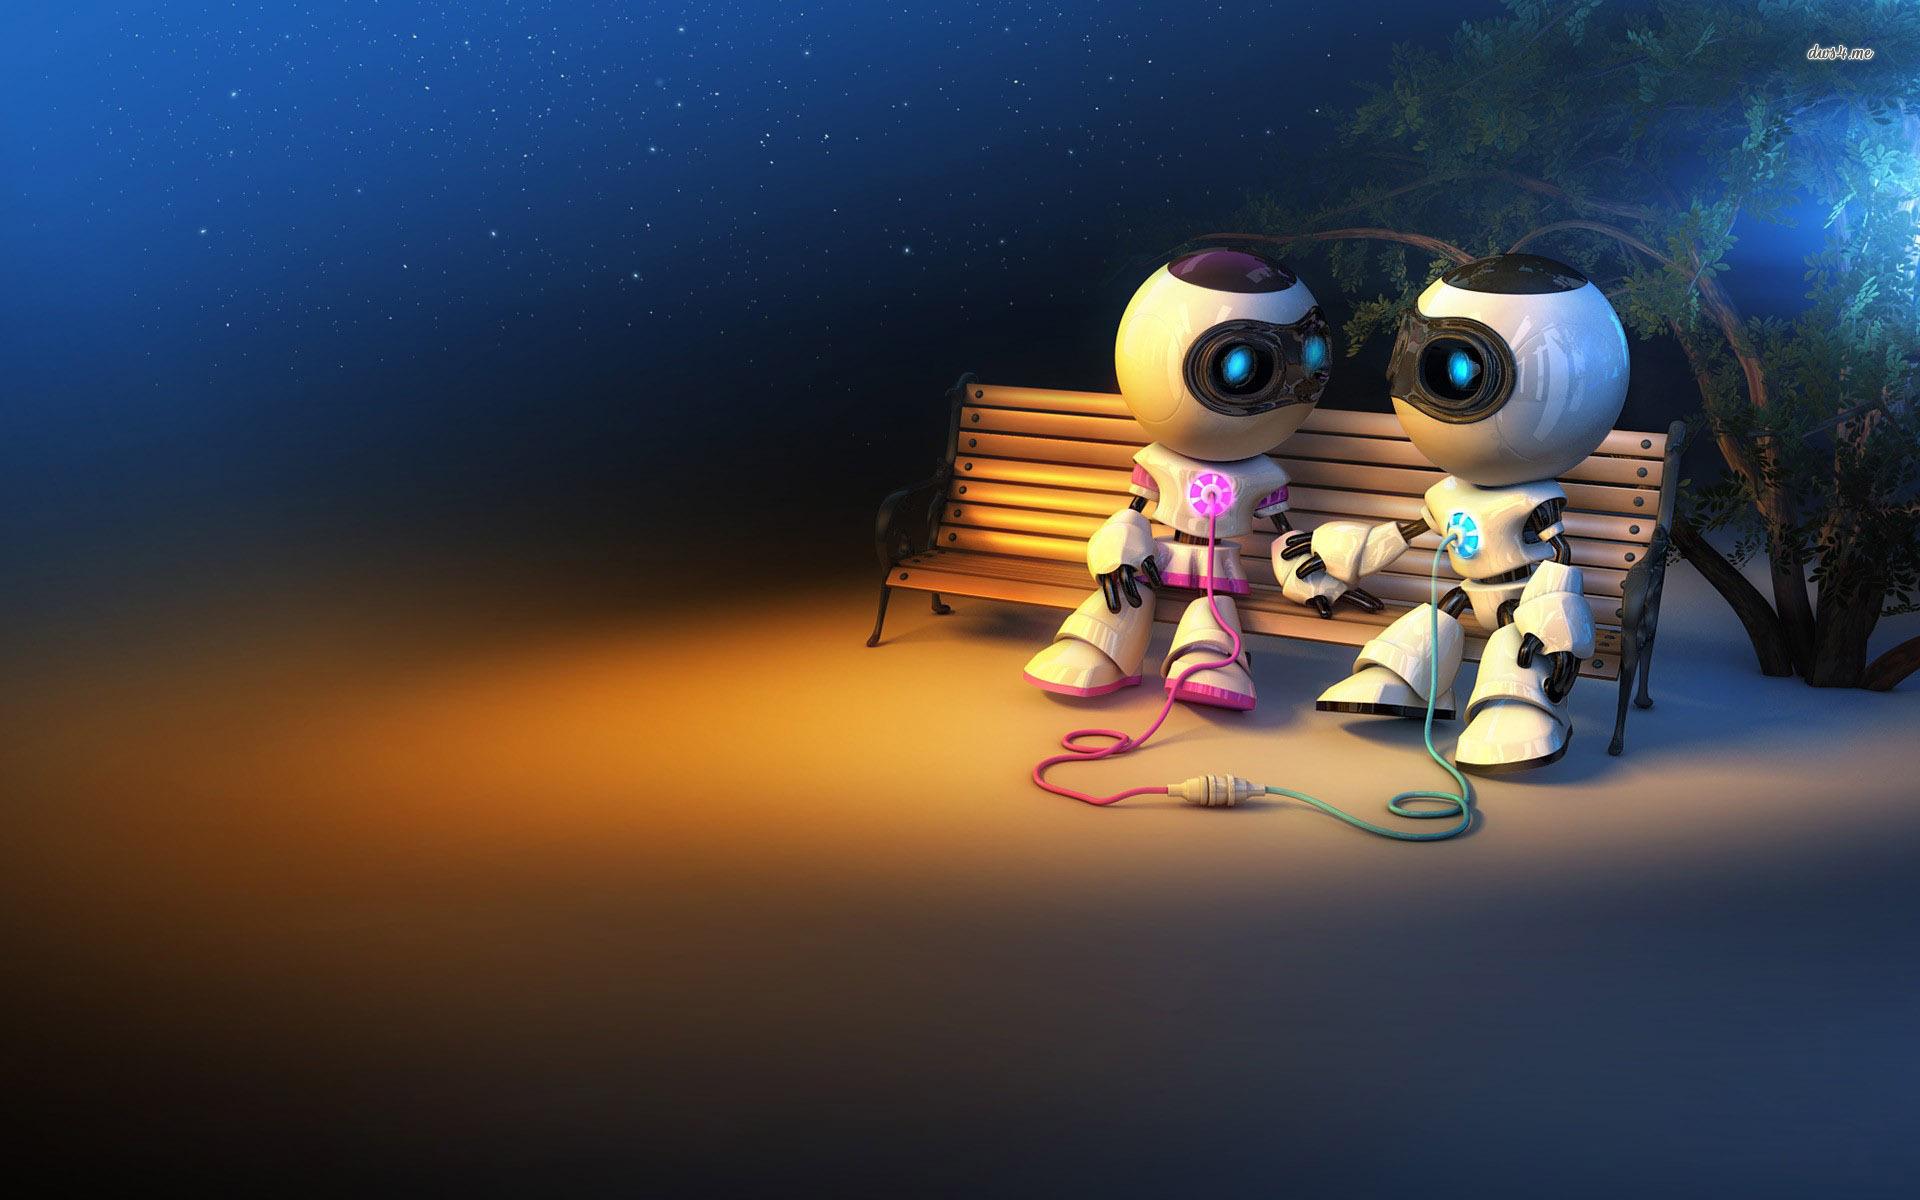 Robot in Love | LOVE